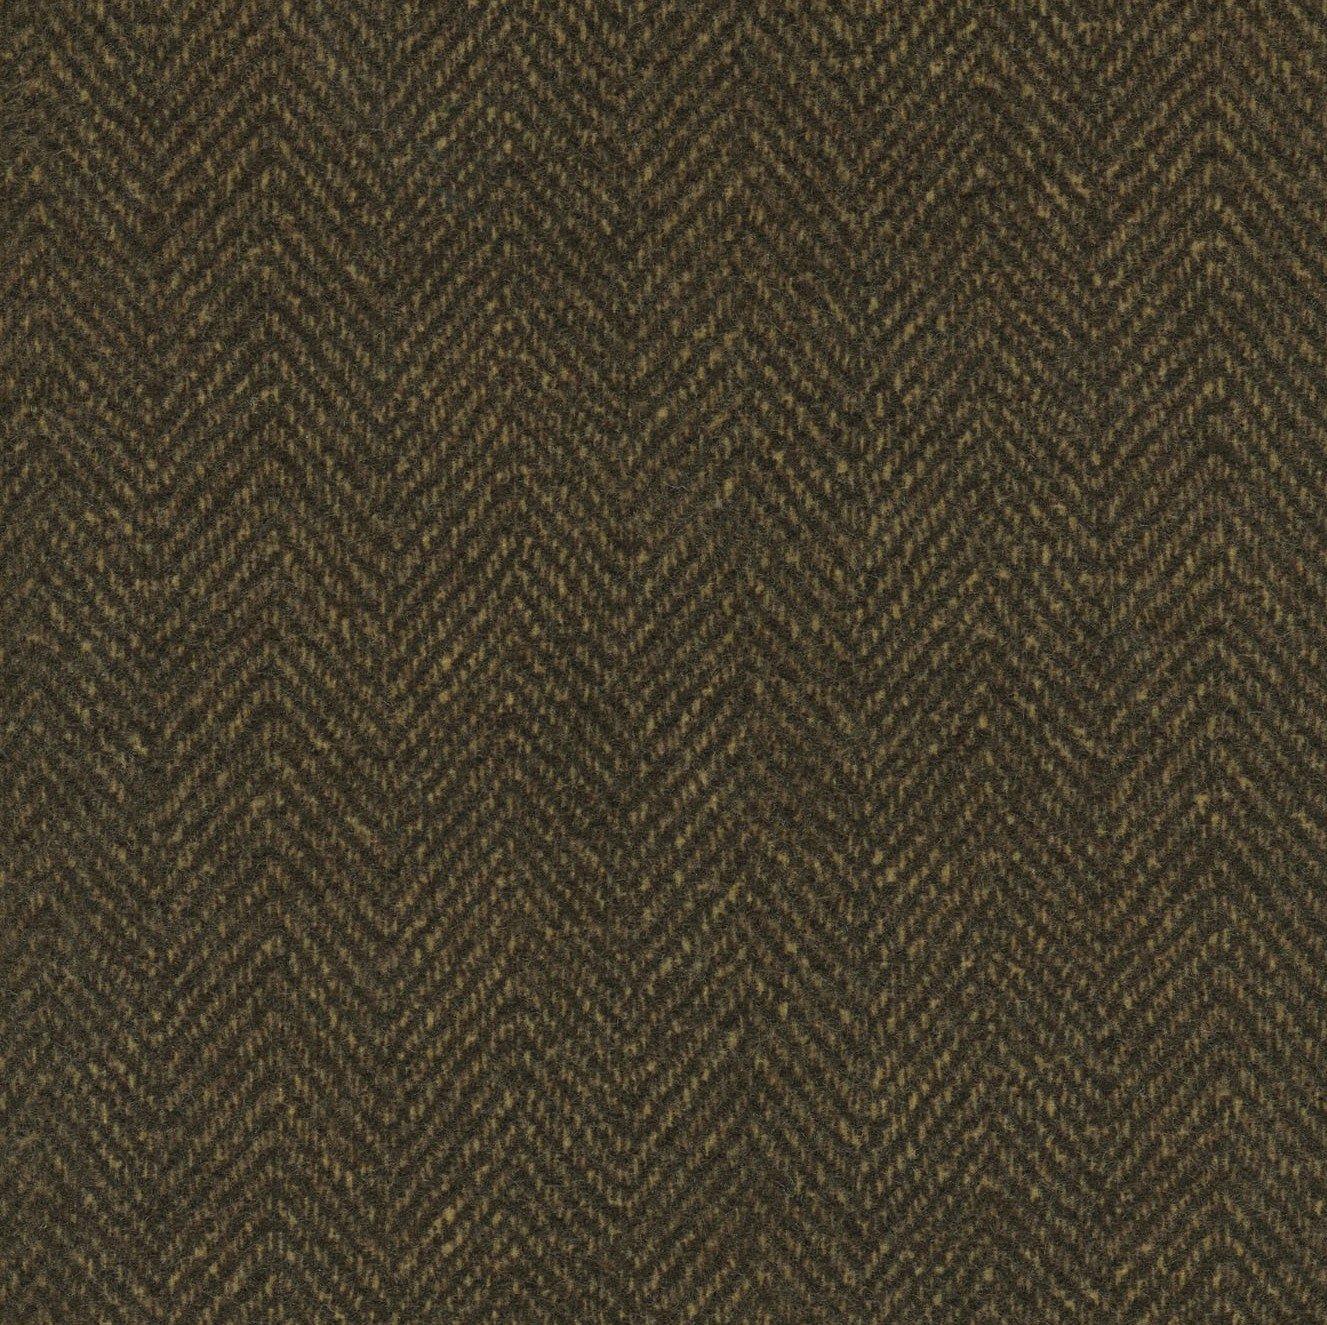 Woolies Flannel Herringbone Double Espresso (MASF1841-J2)